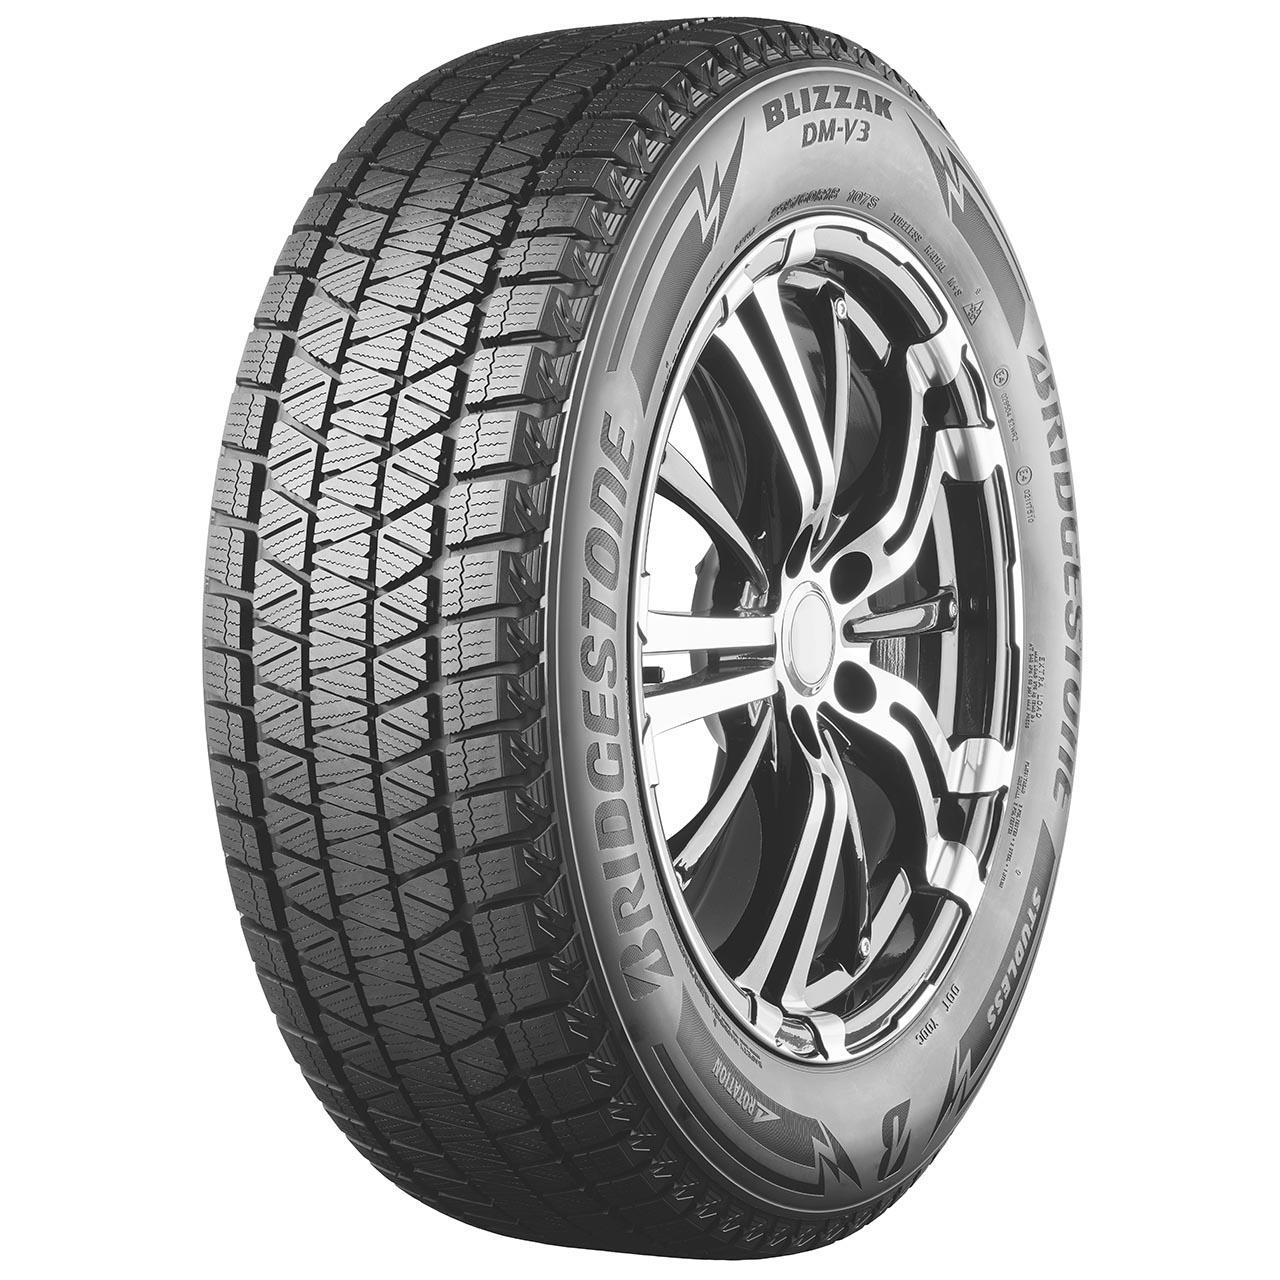 Bridgestone Blizzak DM V3 265/50R19 110T XL SOFT COMPOUND